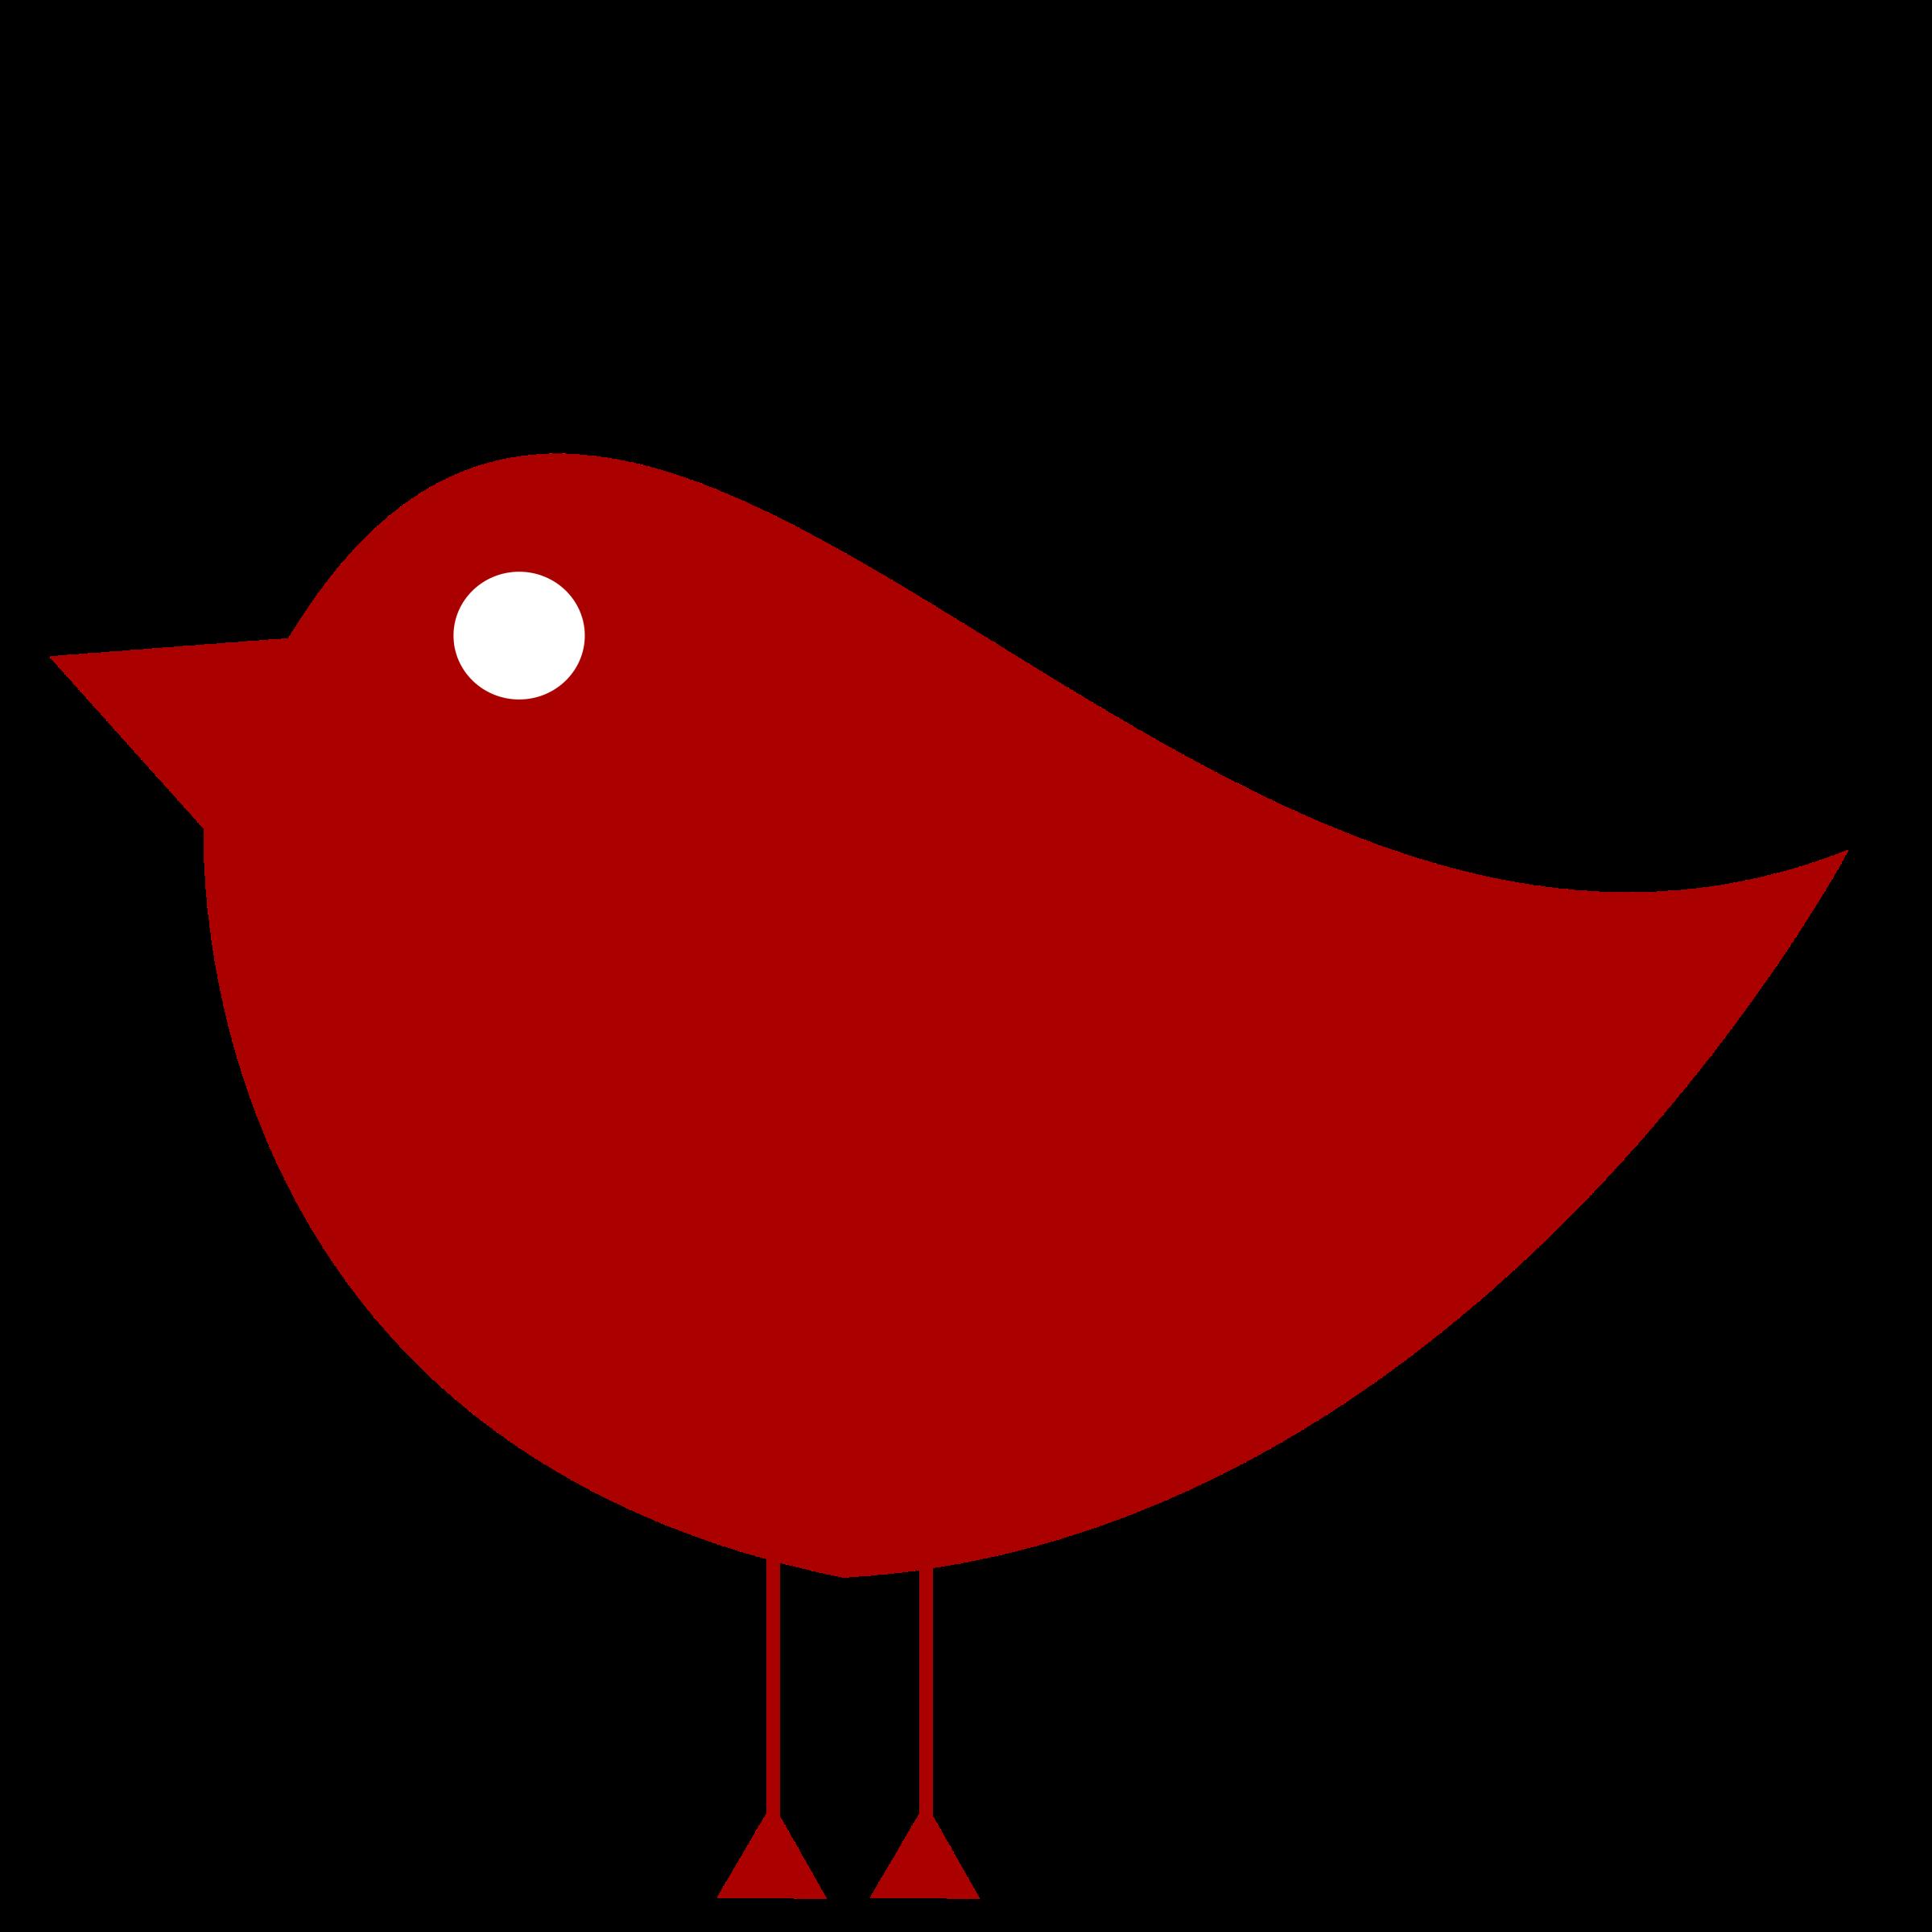 Number 1 clipart color. Simple birdie bird one